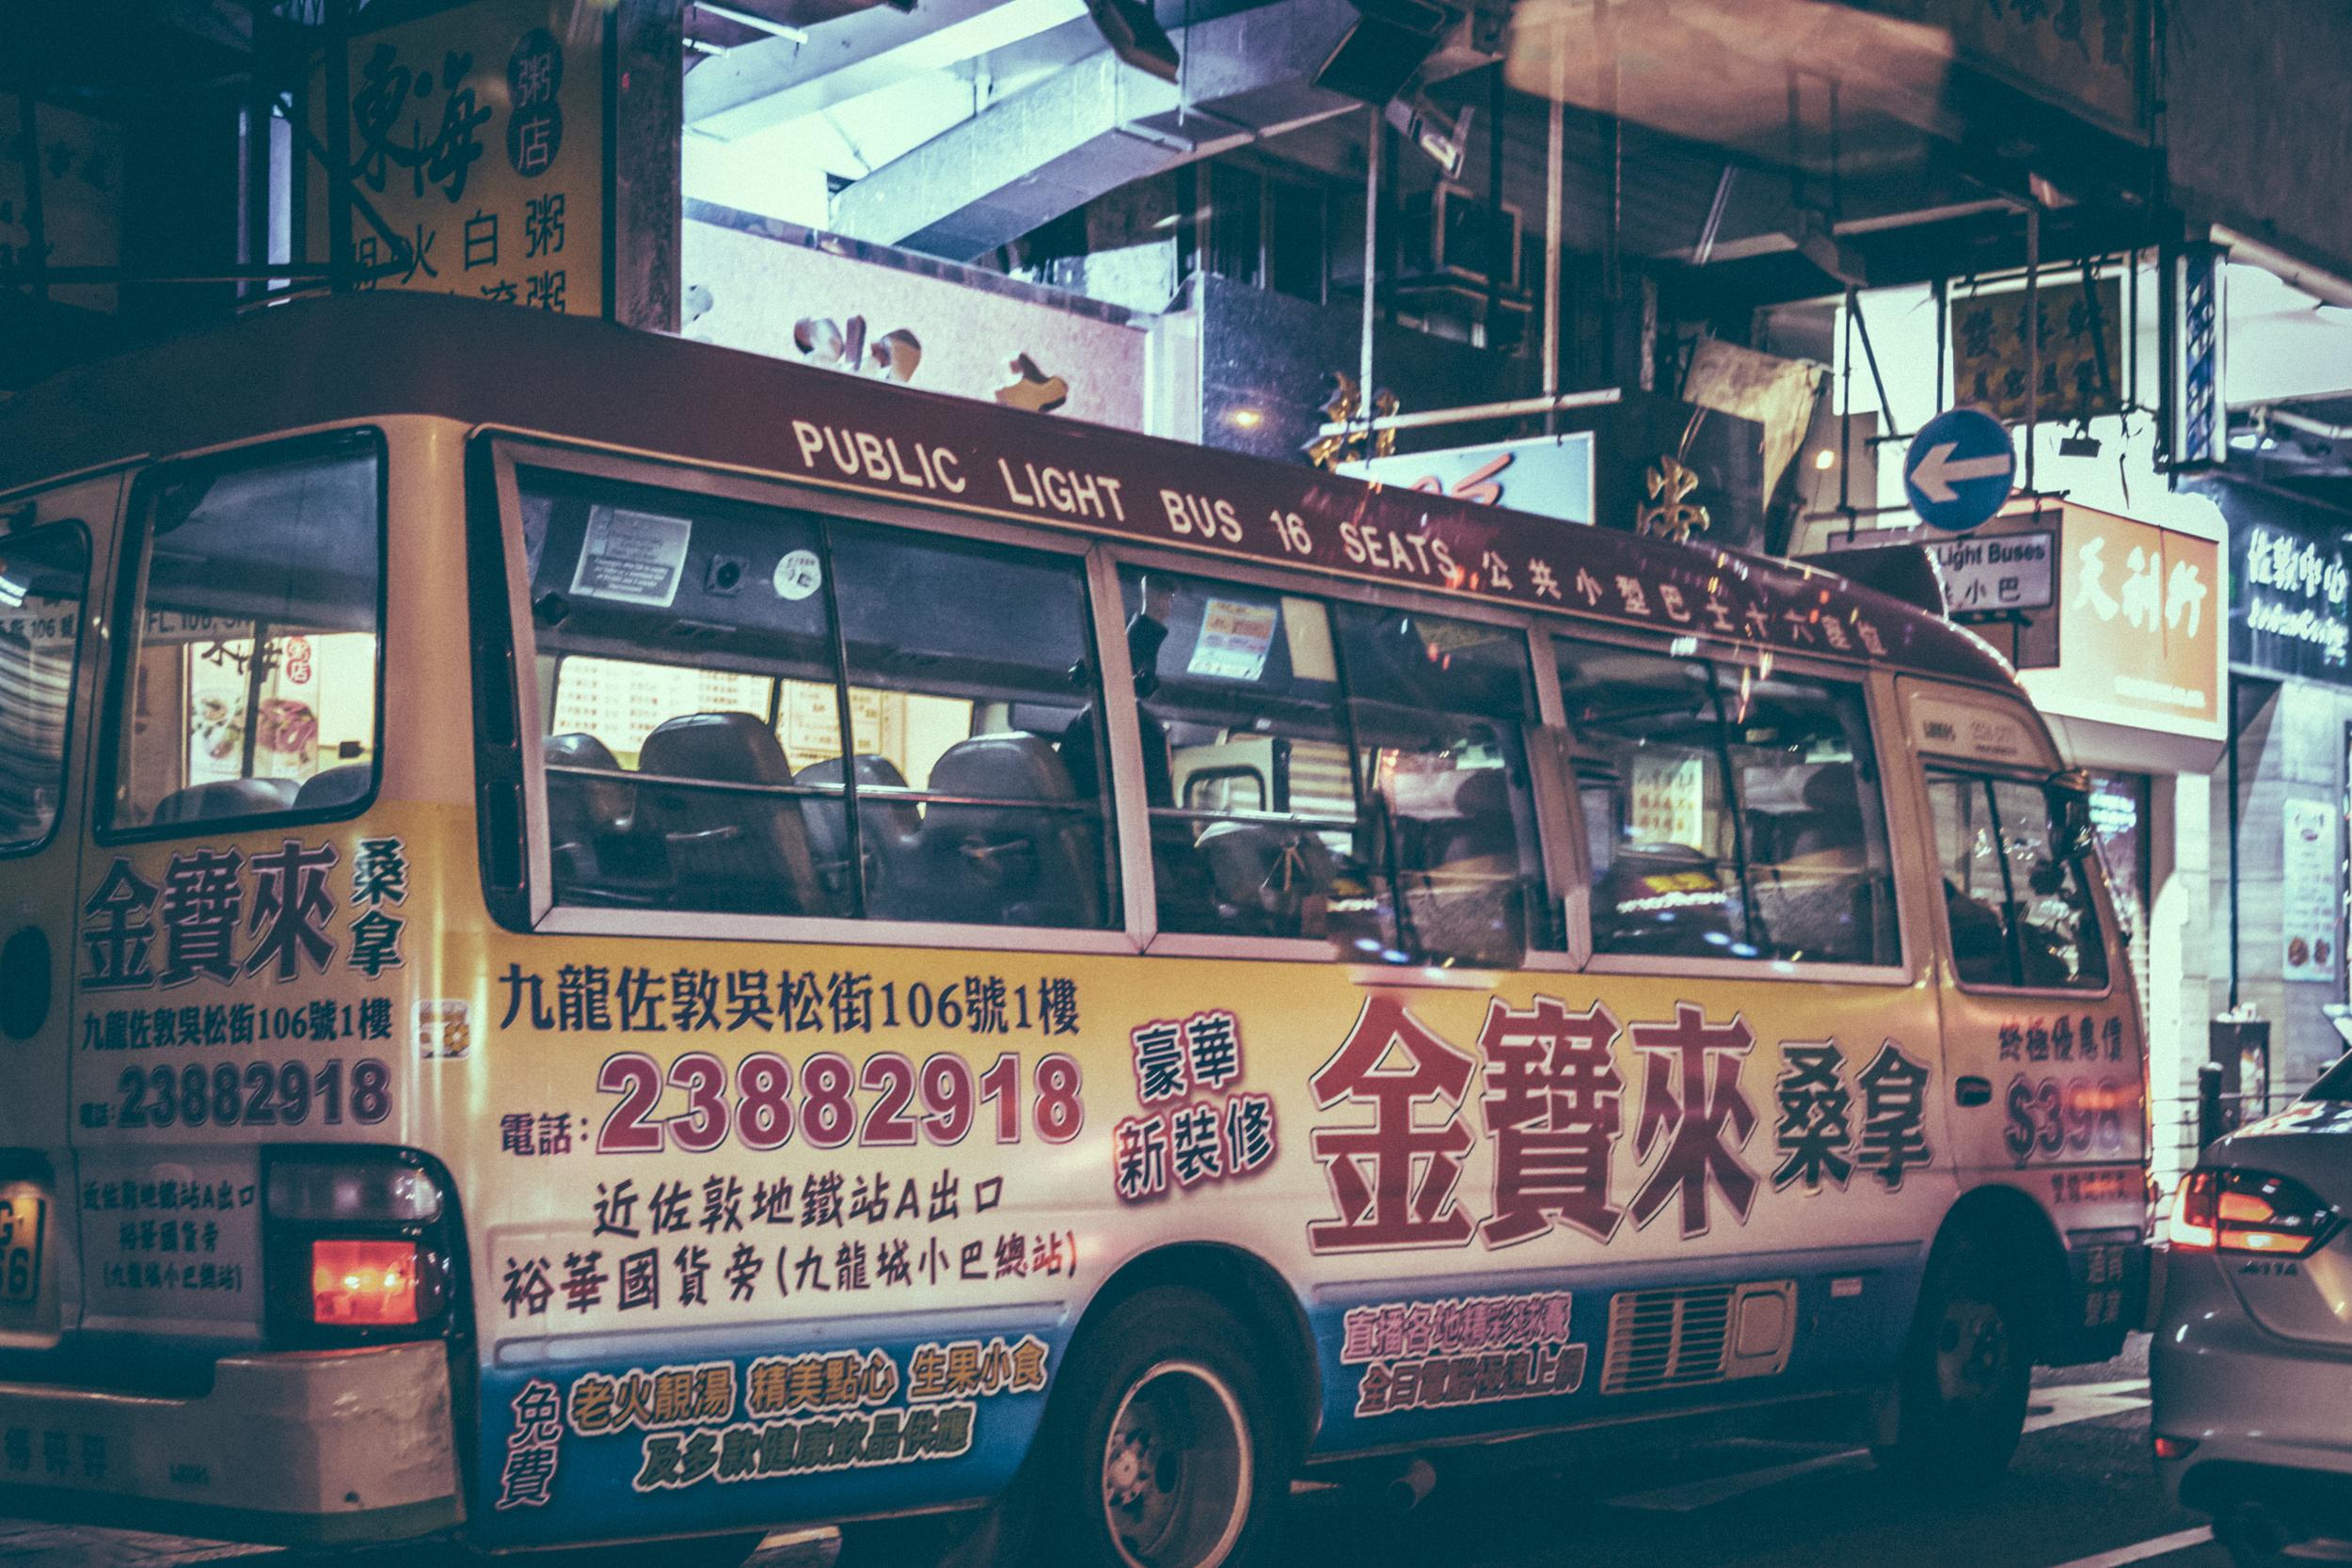 Busses in Hong Kong